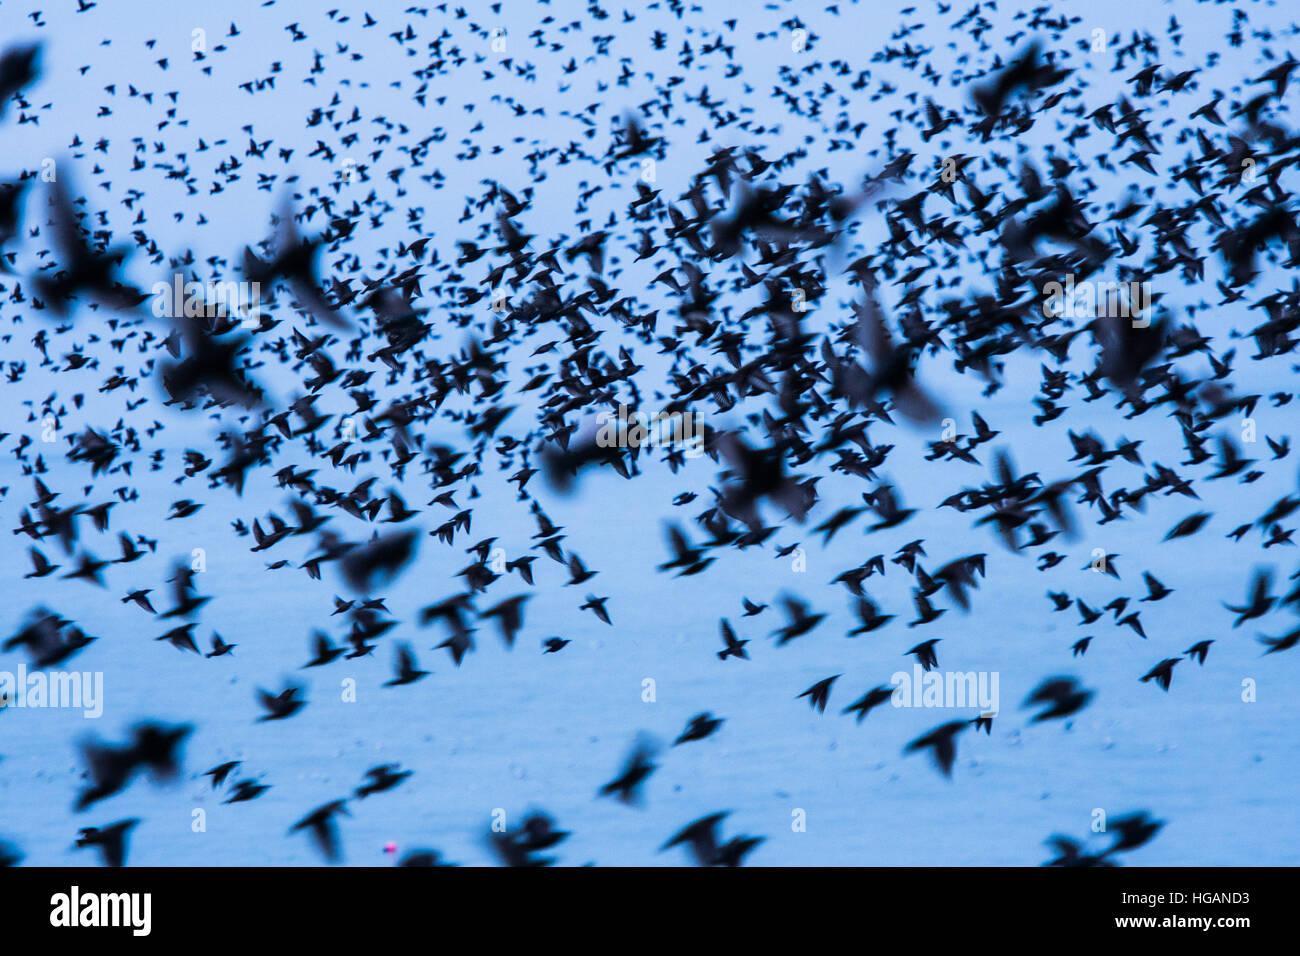 Aberystwyth Wales UK, Saturday 07 January 2017  UK Weather: Flocks of thousands of tiny starlings return at dusk - Stock Image